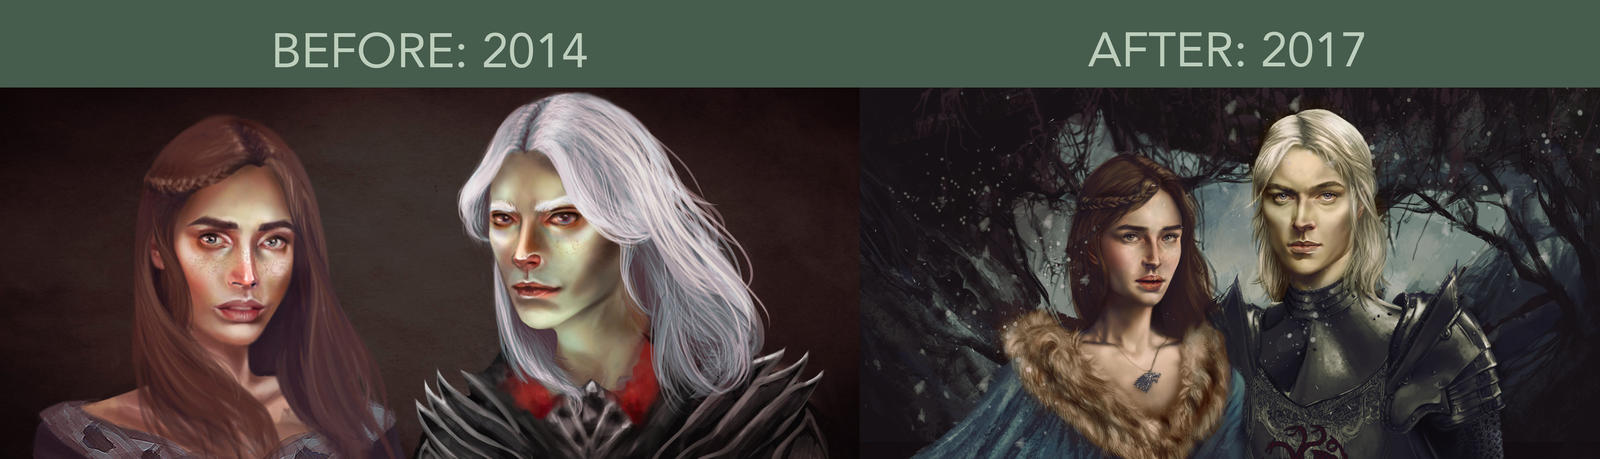 Draw this Again: Rhaegar and Lyanna by Silvaticus